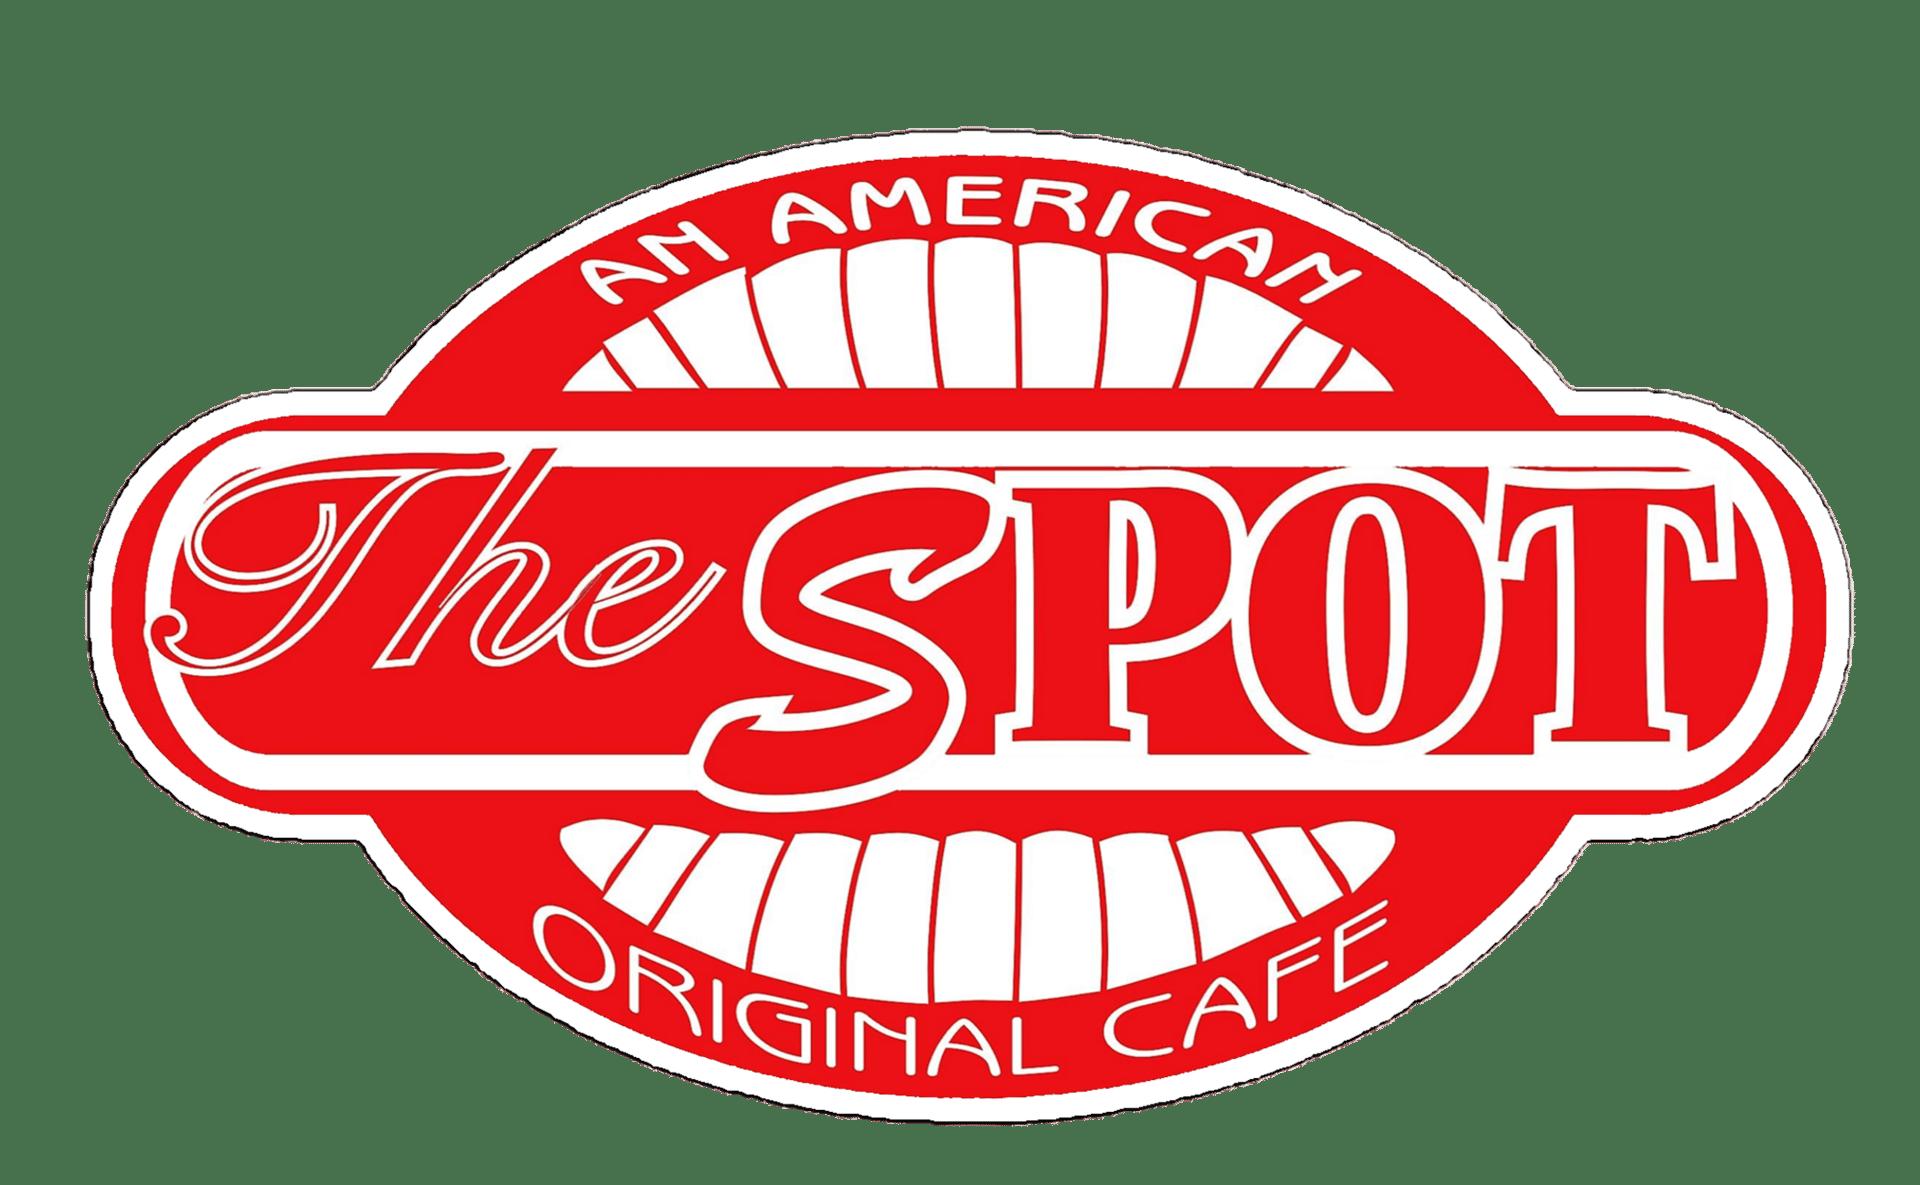 The Spot An American Original Cafe